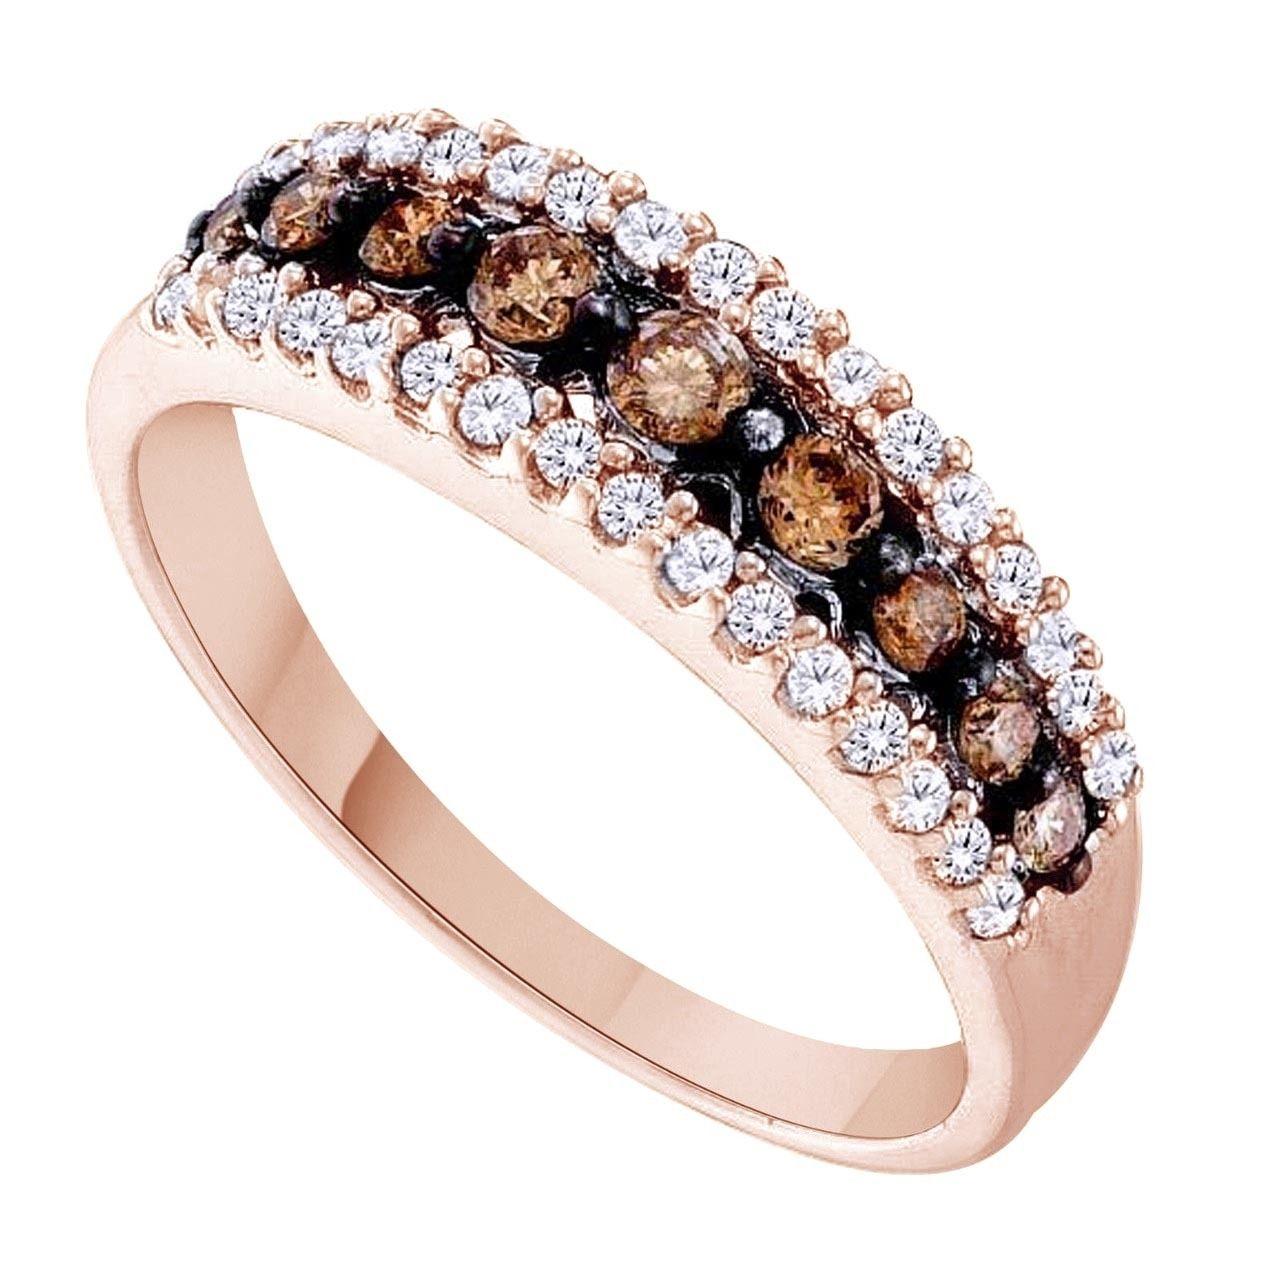 10K Rose Gold Brown Champagne Diamond Wedding Band